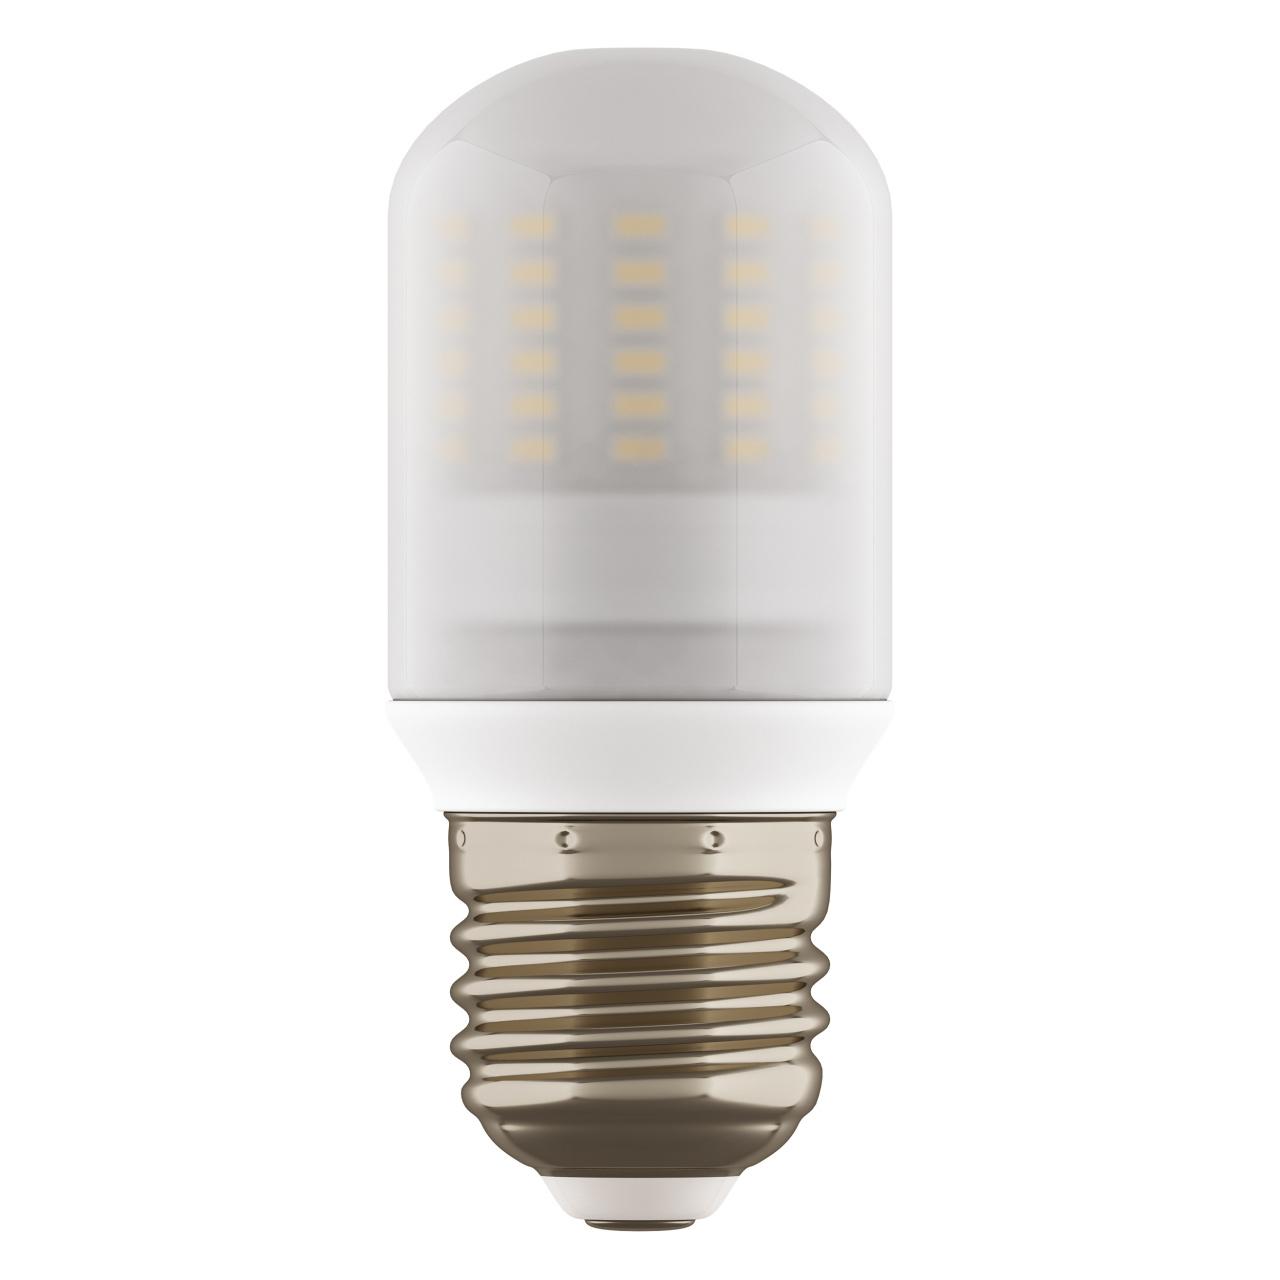 Лампа LED 220V T35 E27 9W=90W 770LM 360G FR 4000K 20000H Lightstar 930914